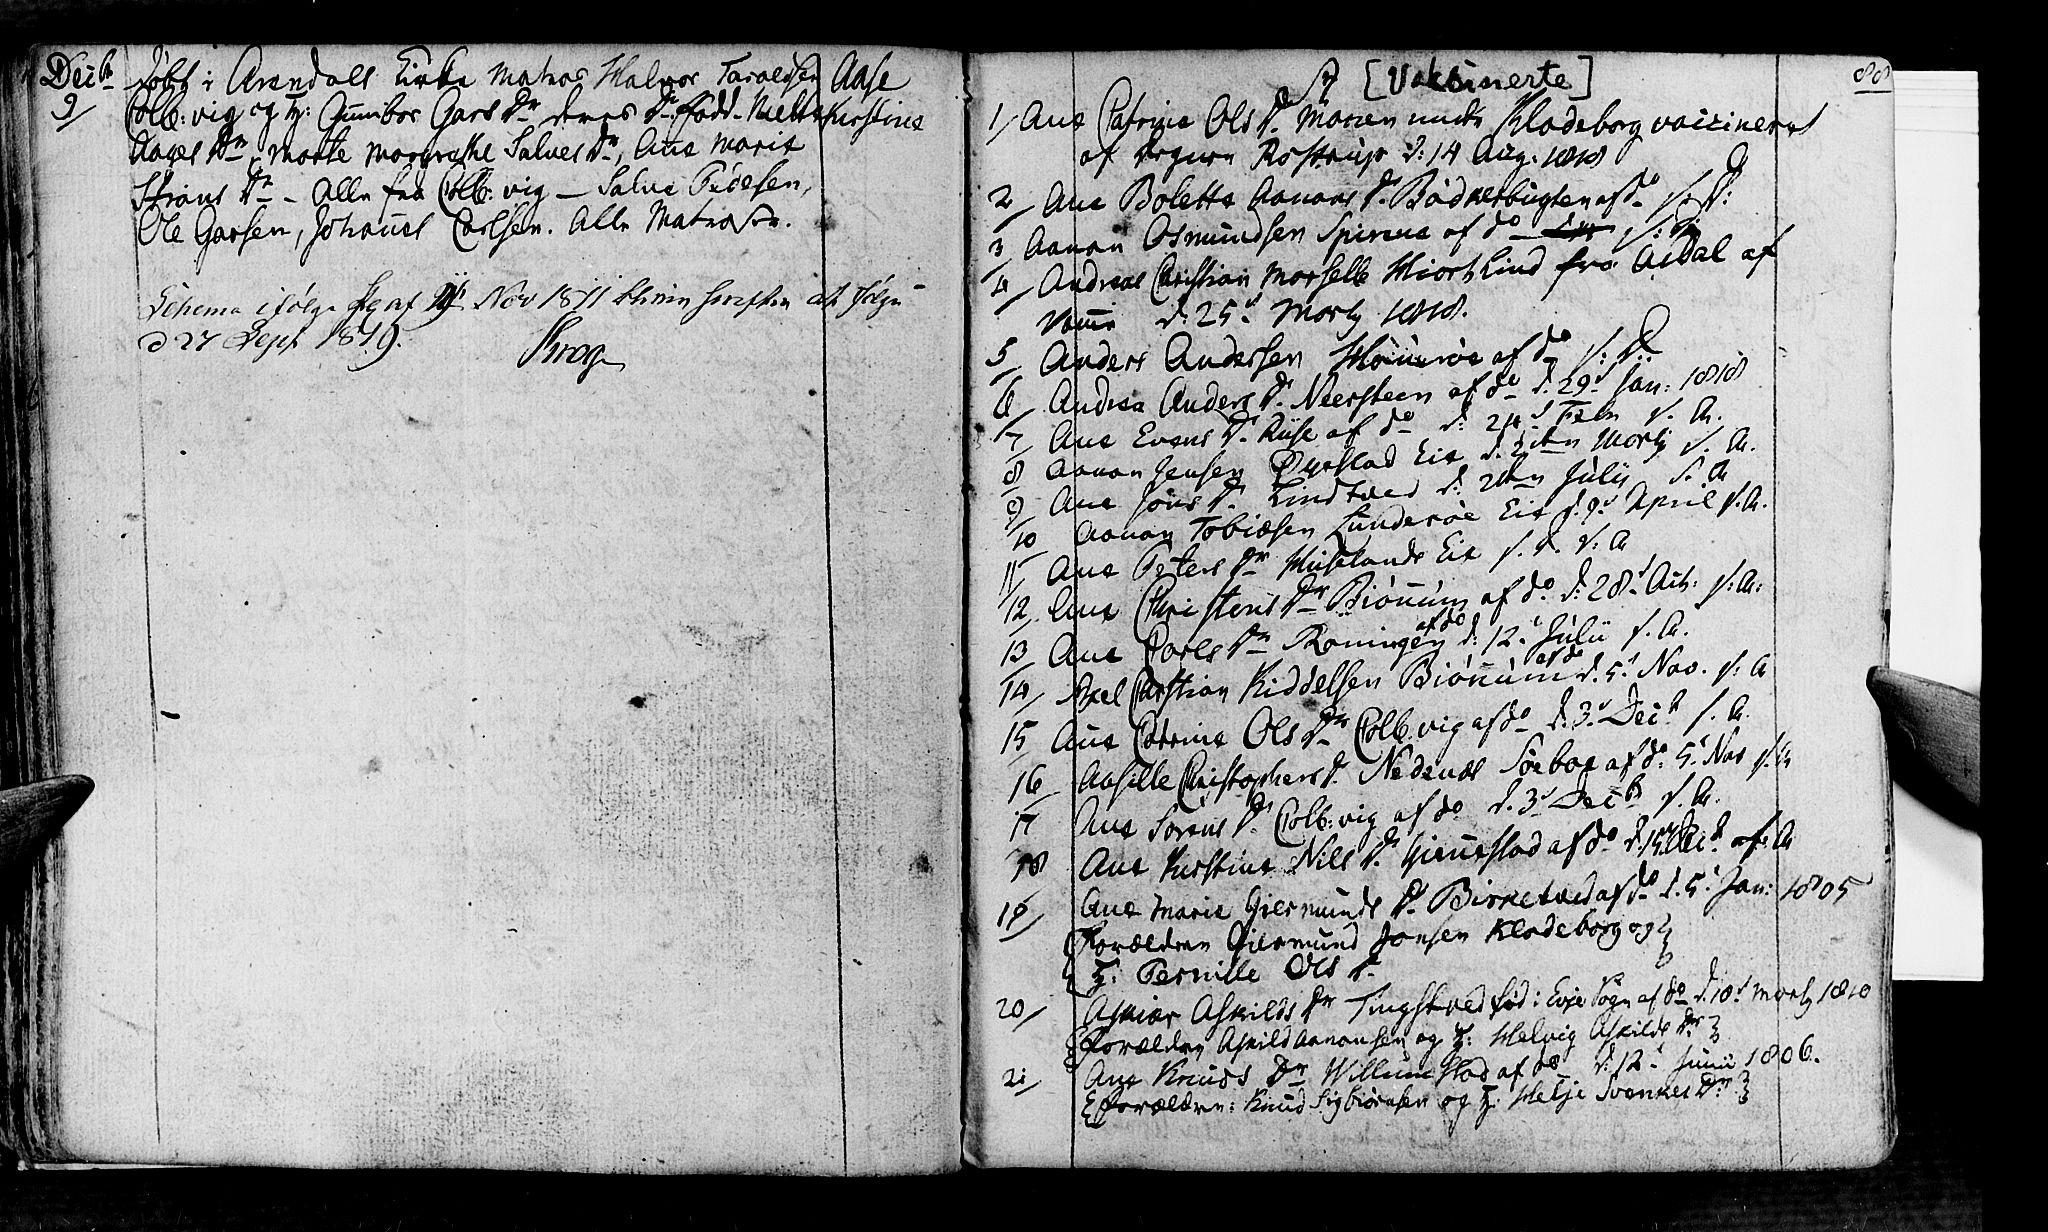 SAK, Øyestad sokneprestkontor, F/Fa/L0011: Ministerialbok nr. A 11, 1805-1824, s. 88